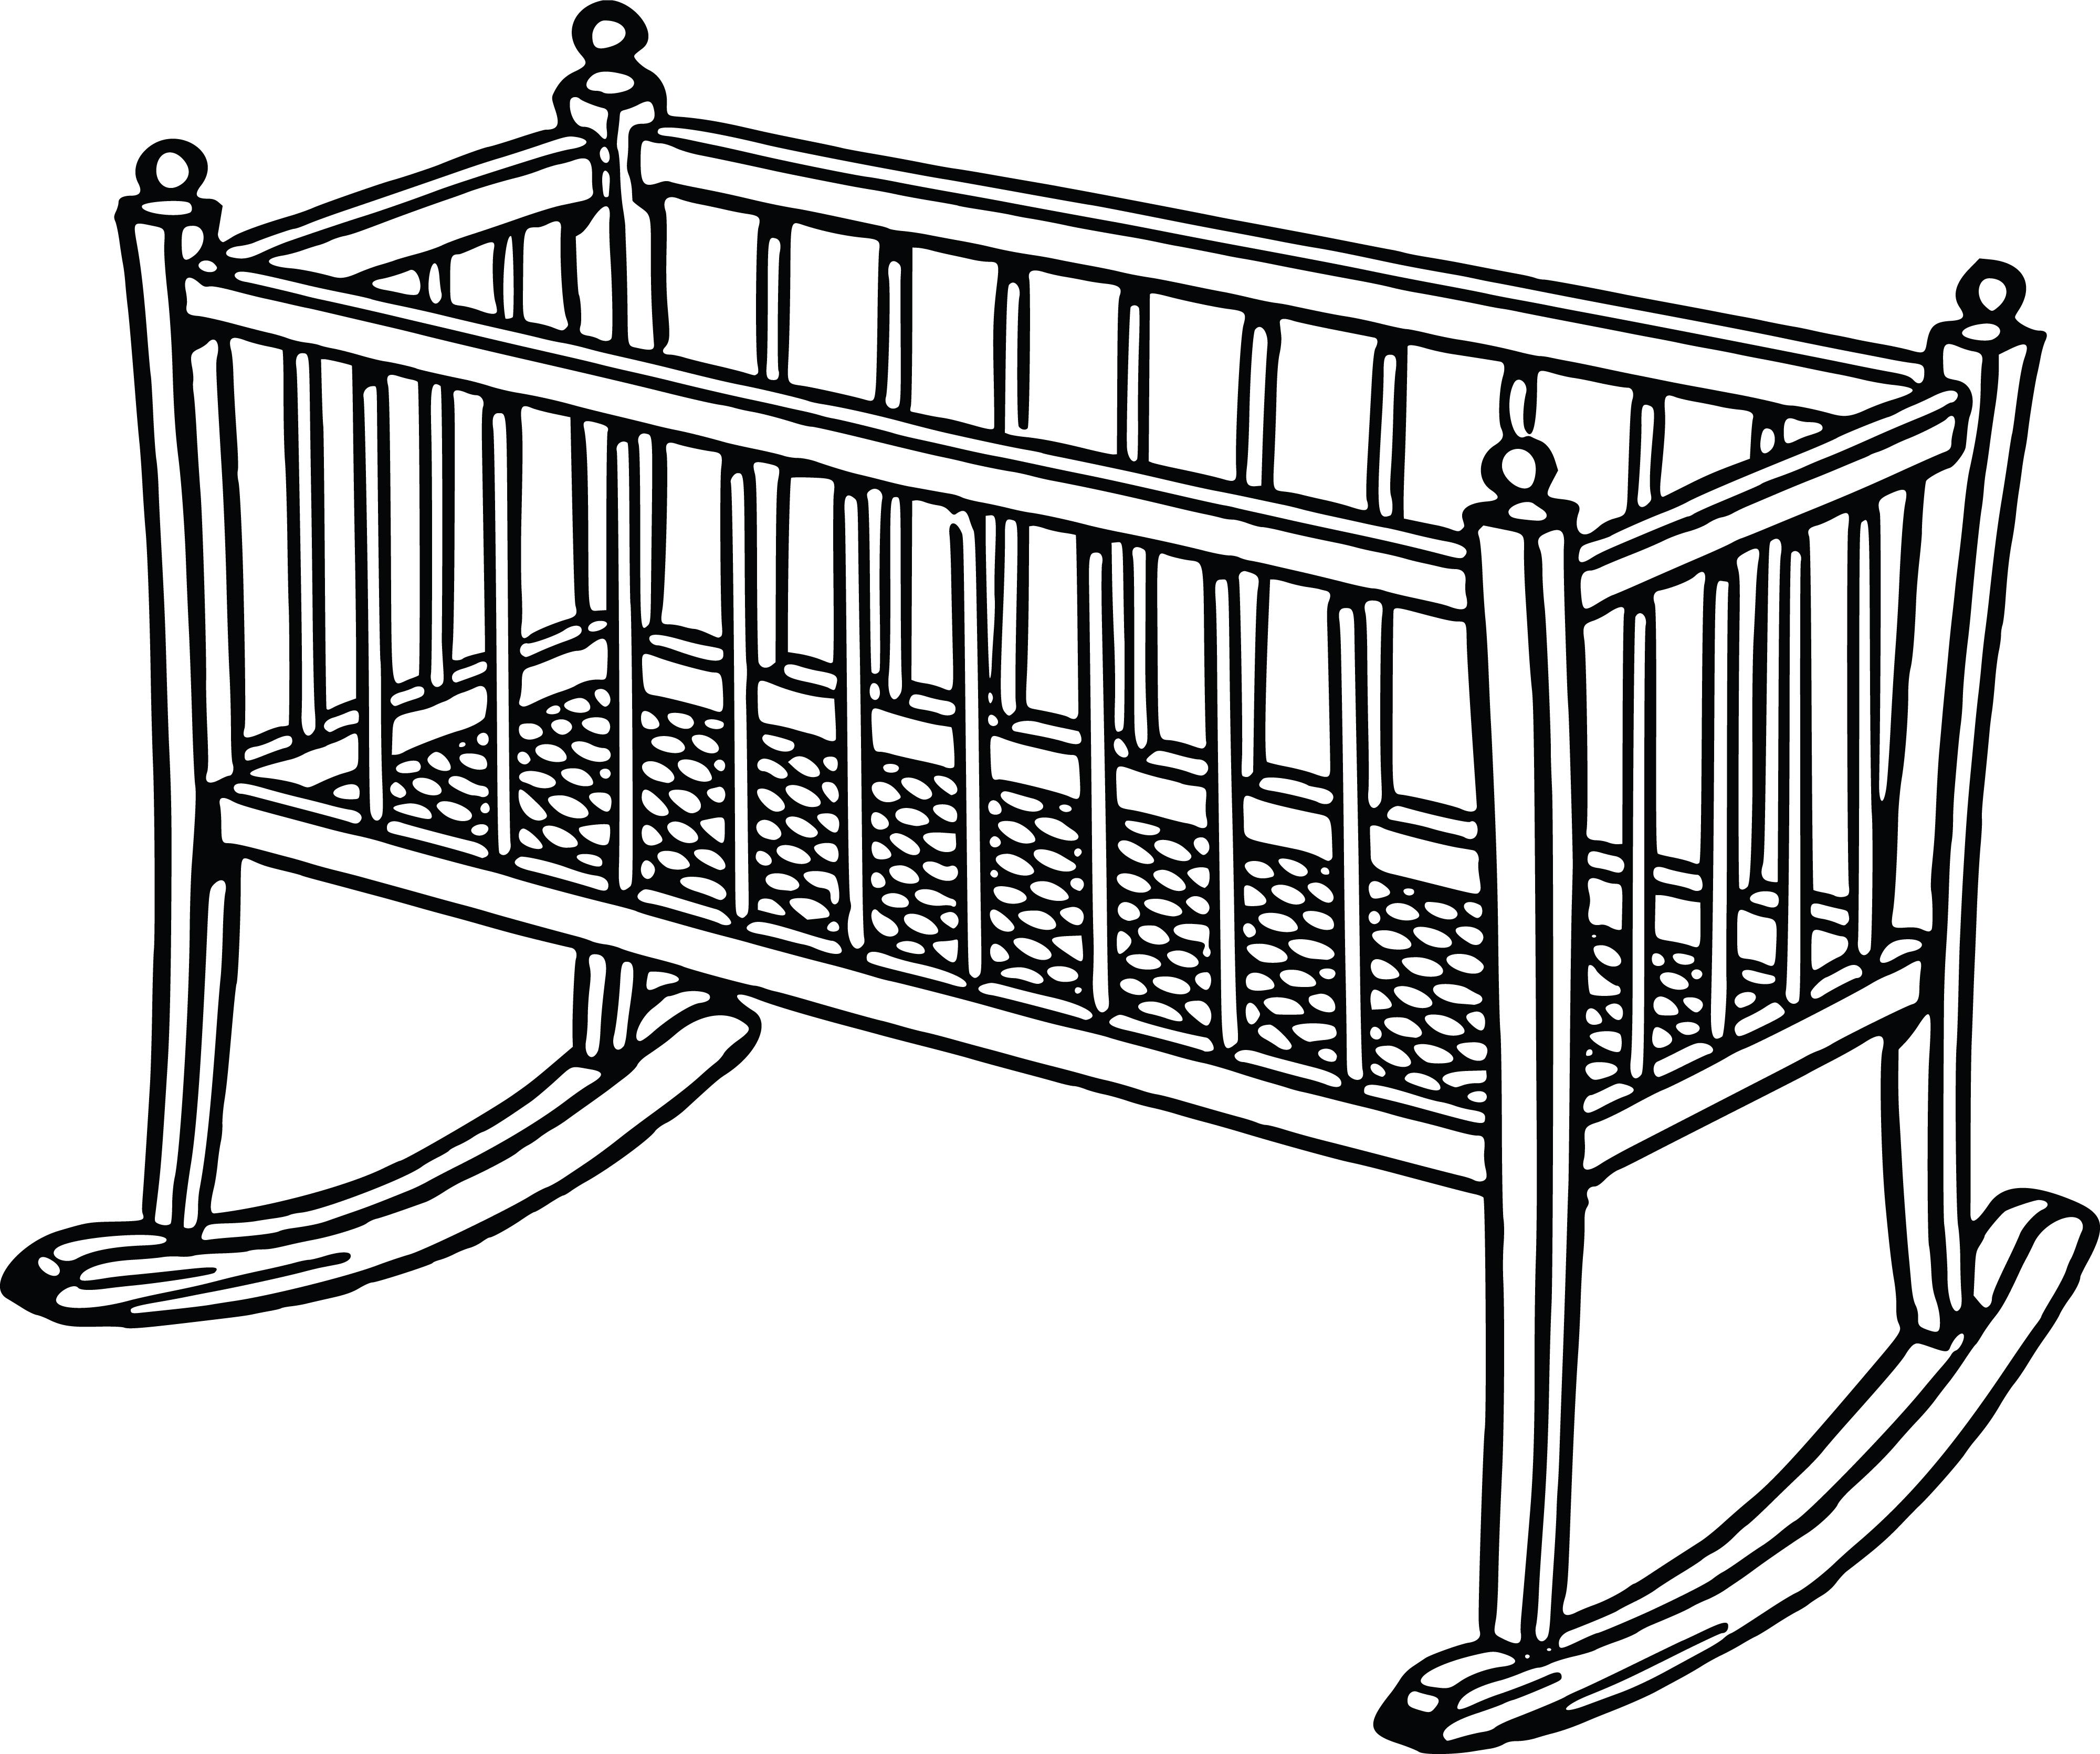 free clipart of a baby crib rh free clipartof com